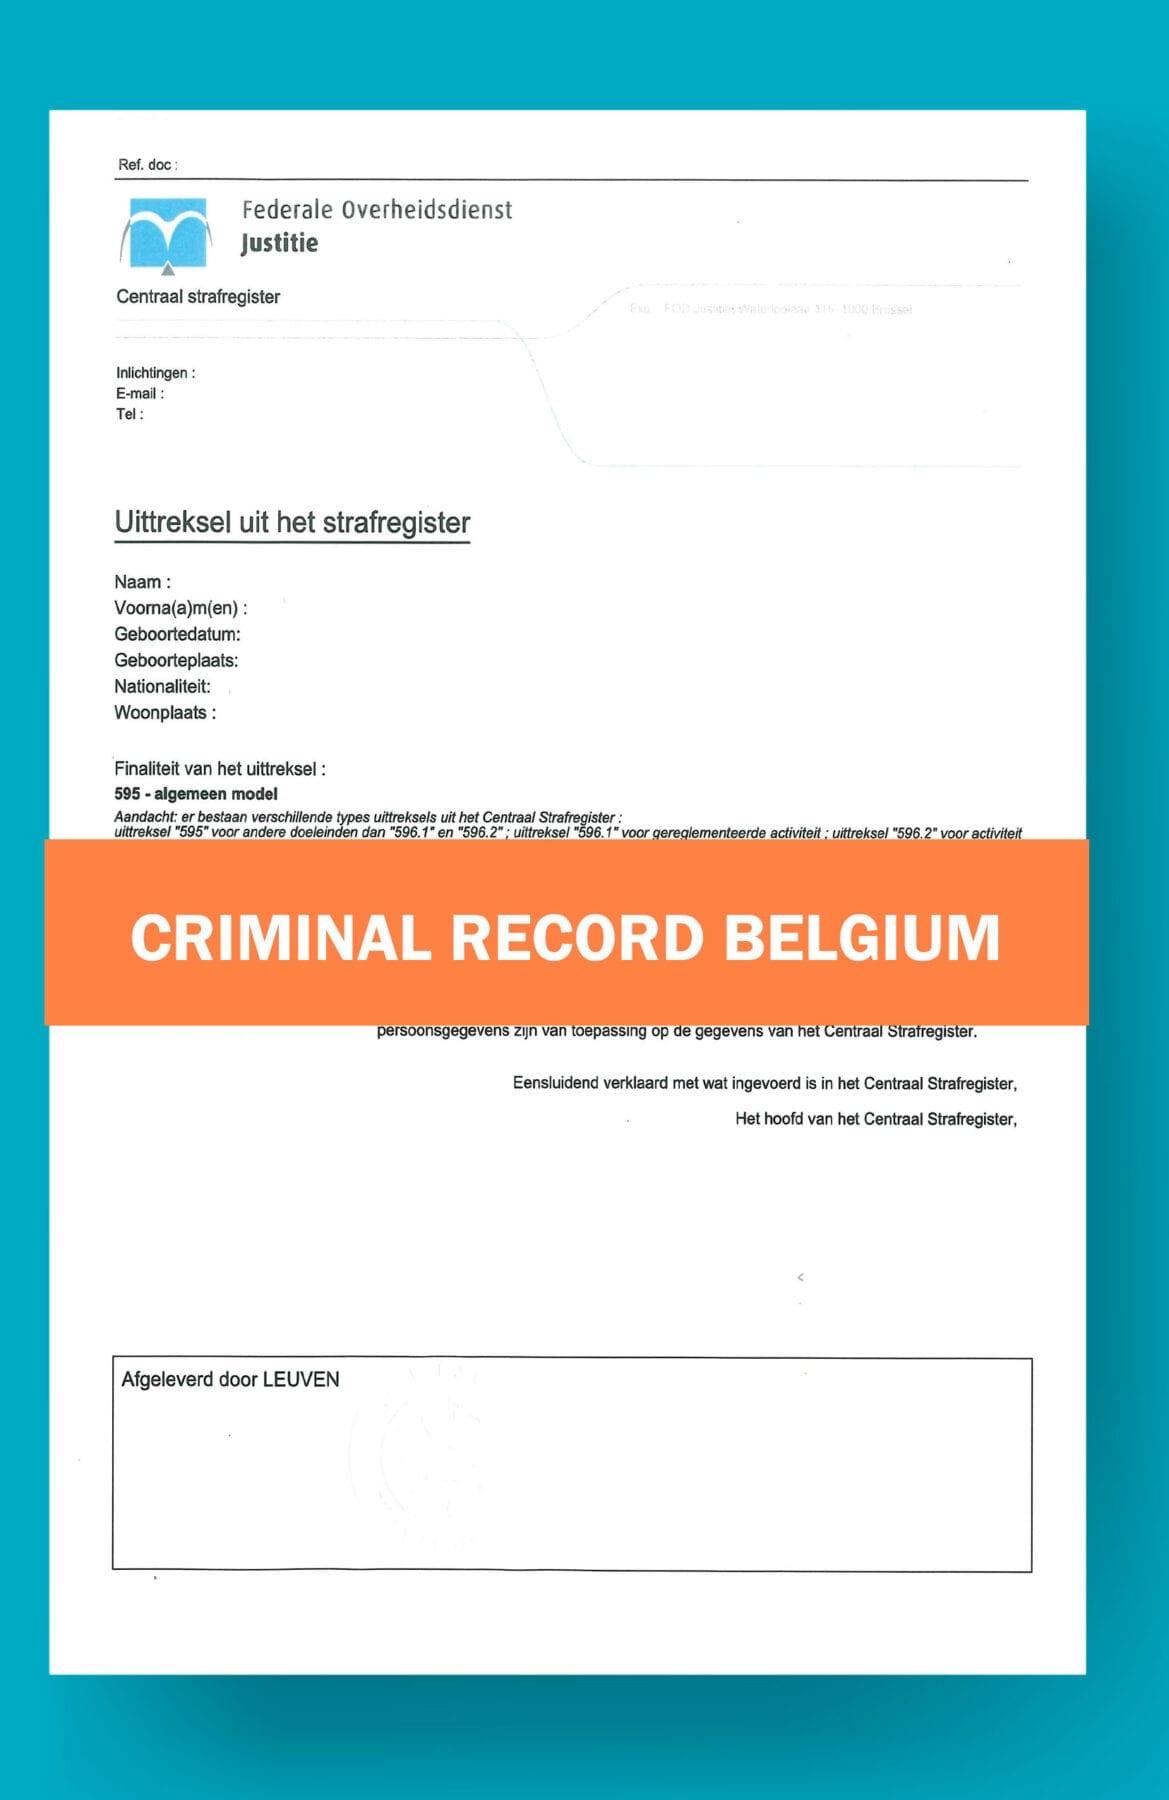 CRIMINAL-RECORD-TEMPLATE-BELGIUM